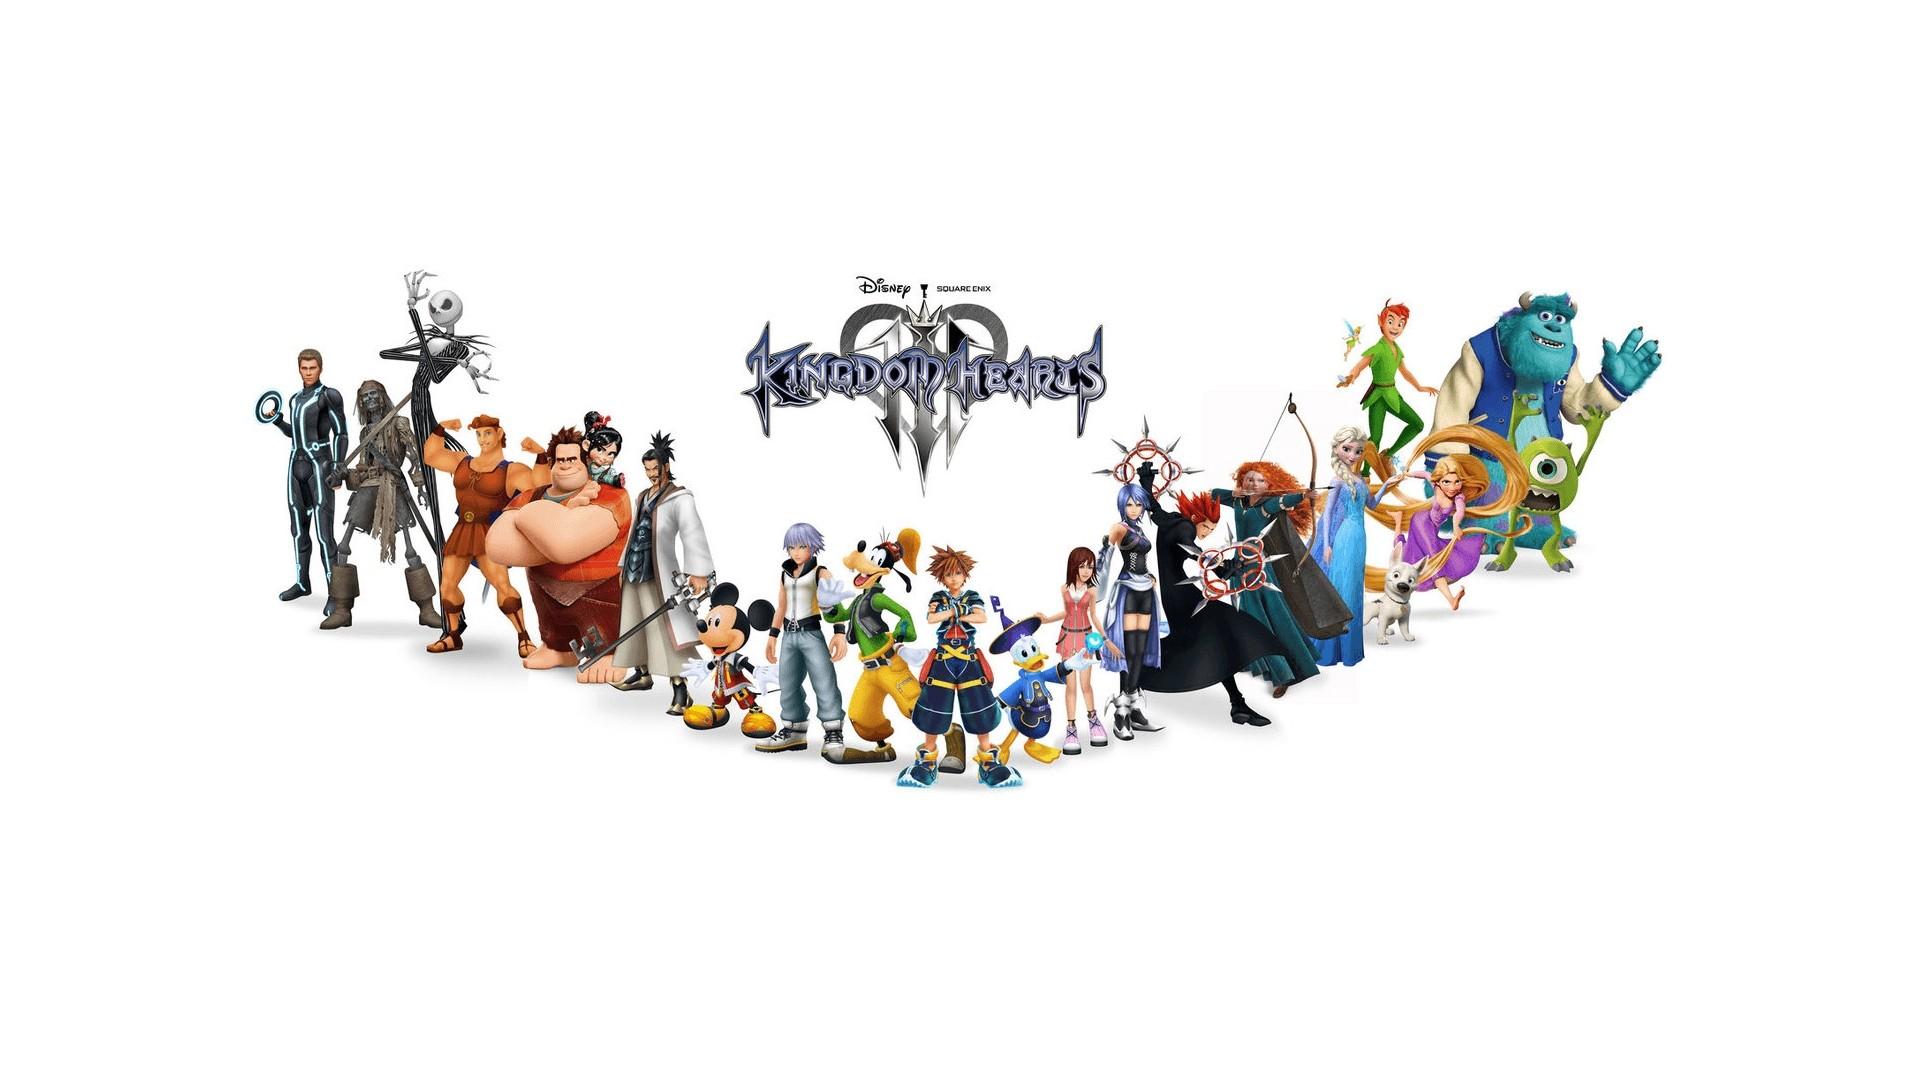 Kingdom Hearts 3 Wallpaper for pc